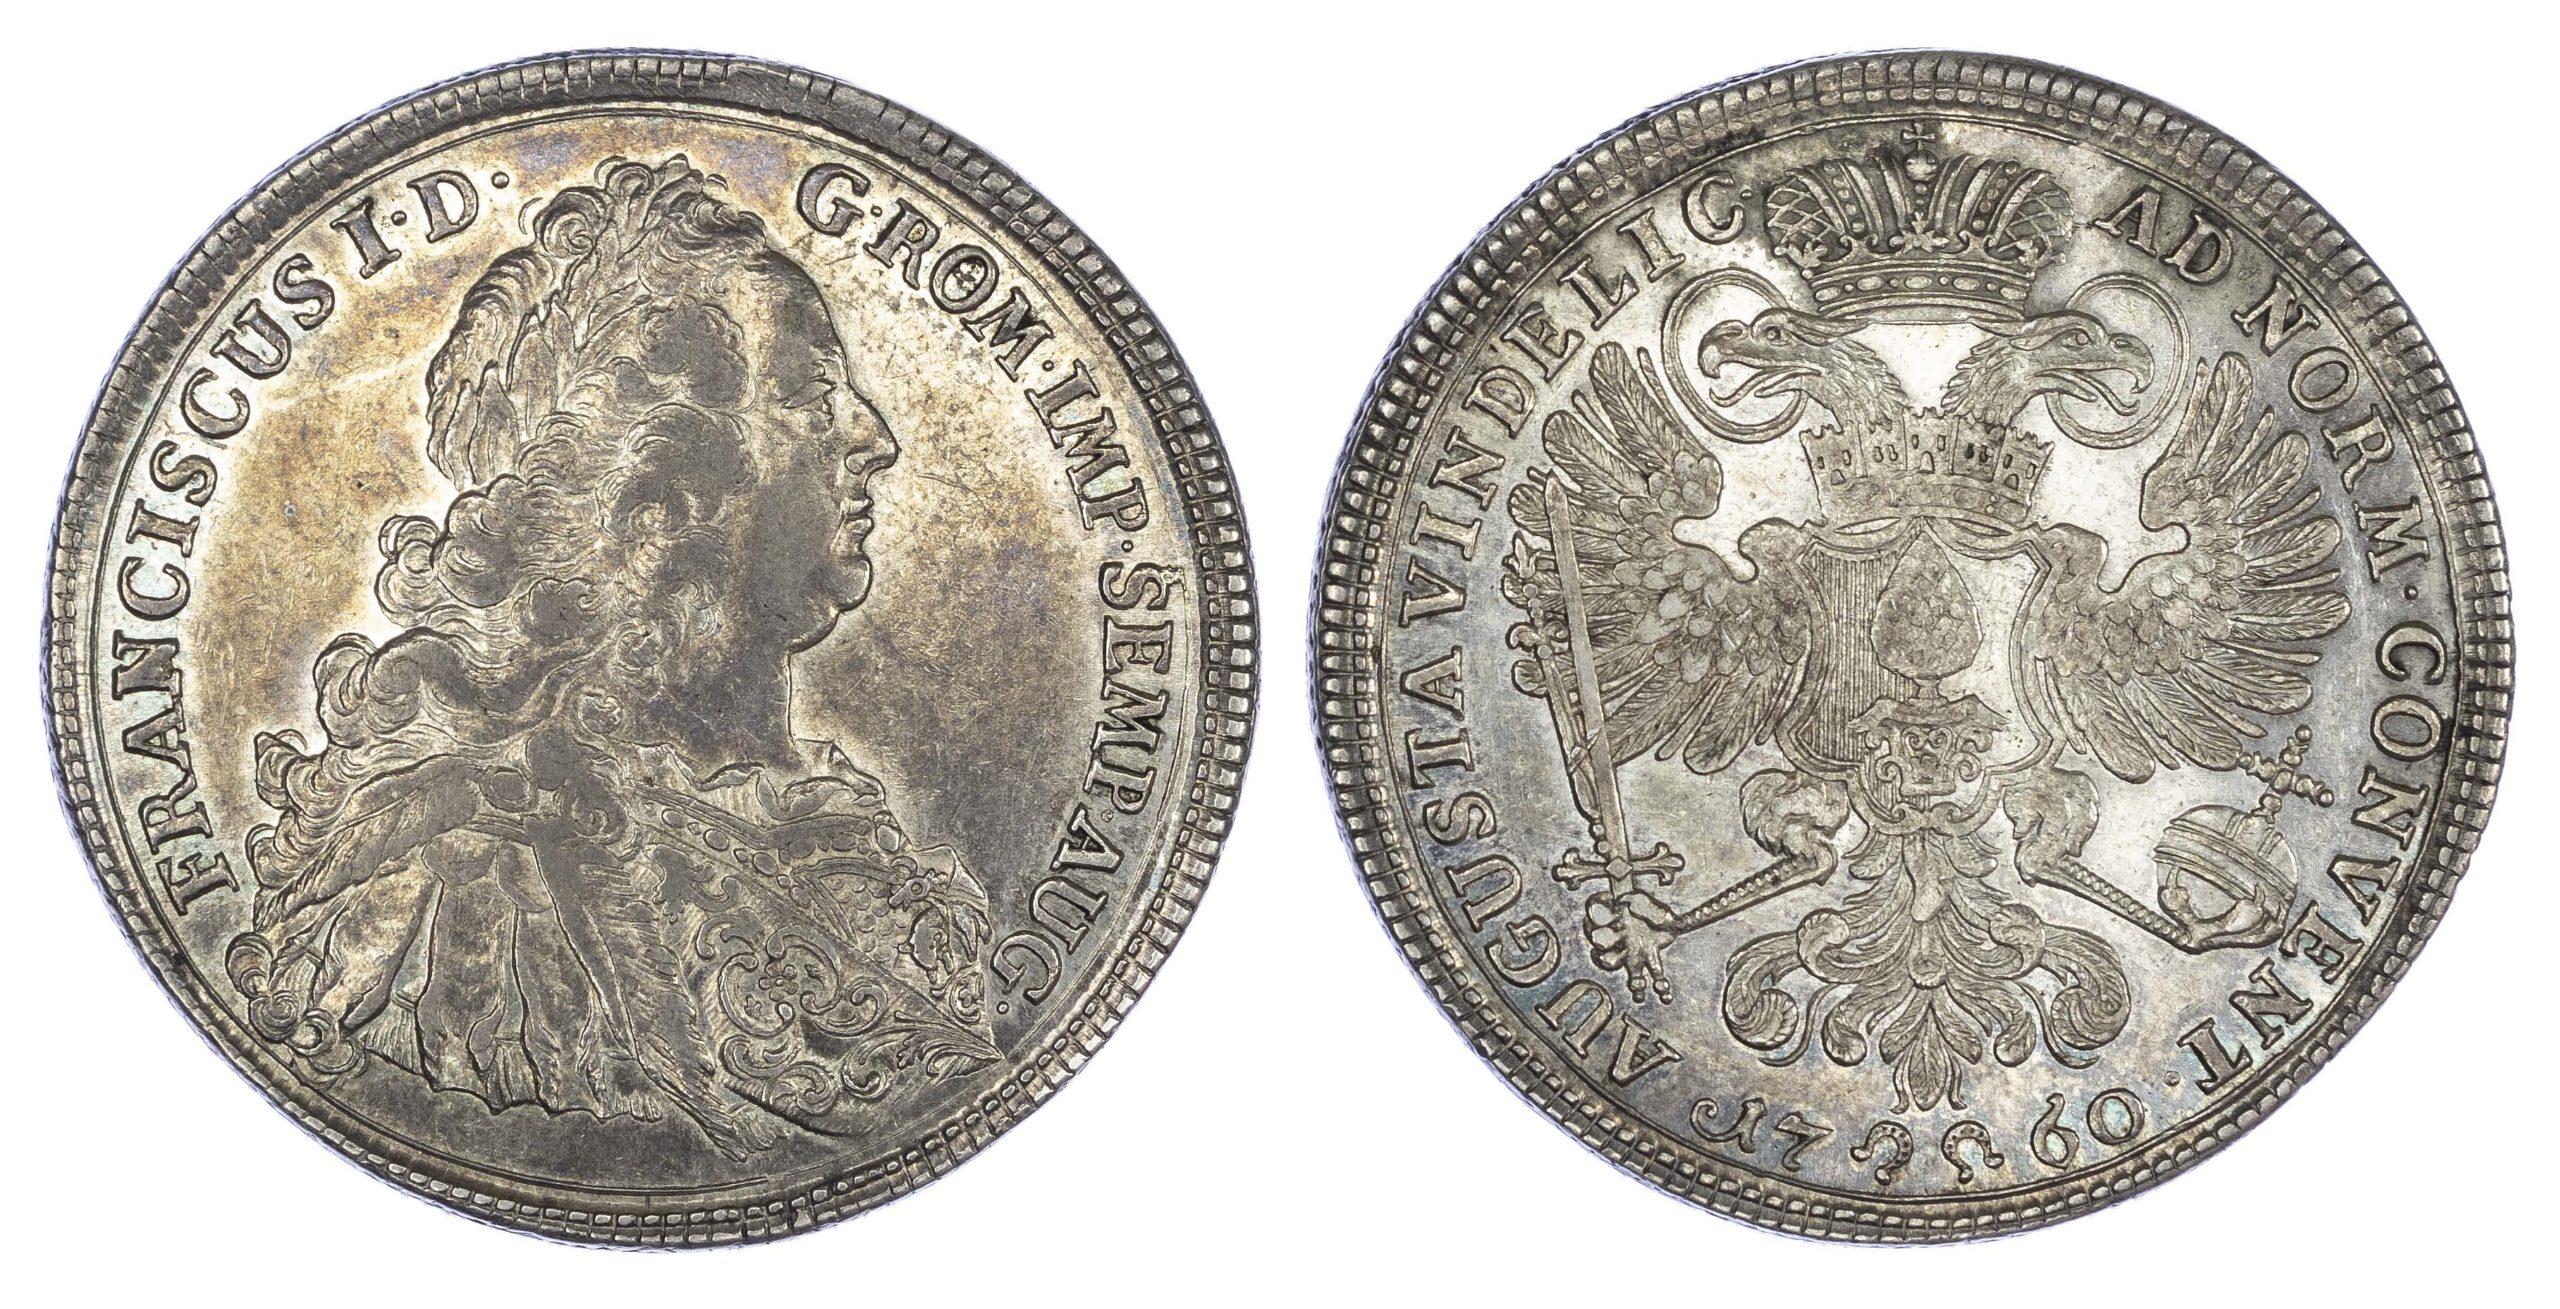 Germany, Augsburg, Franz Stefan I (1745-65 AD), silver Taler, 1760